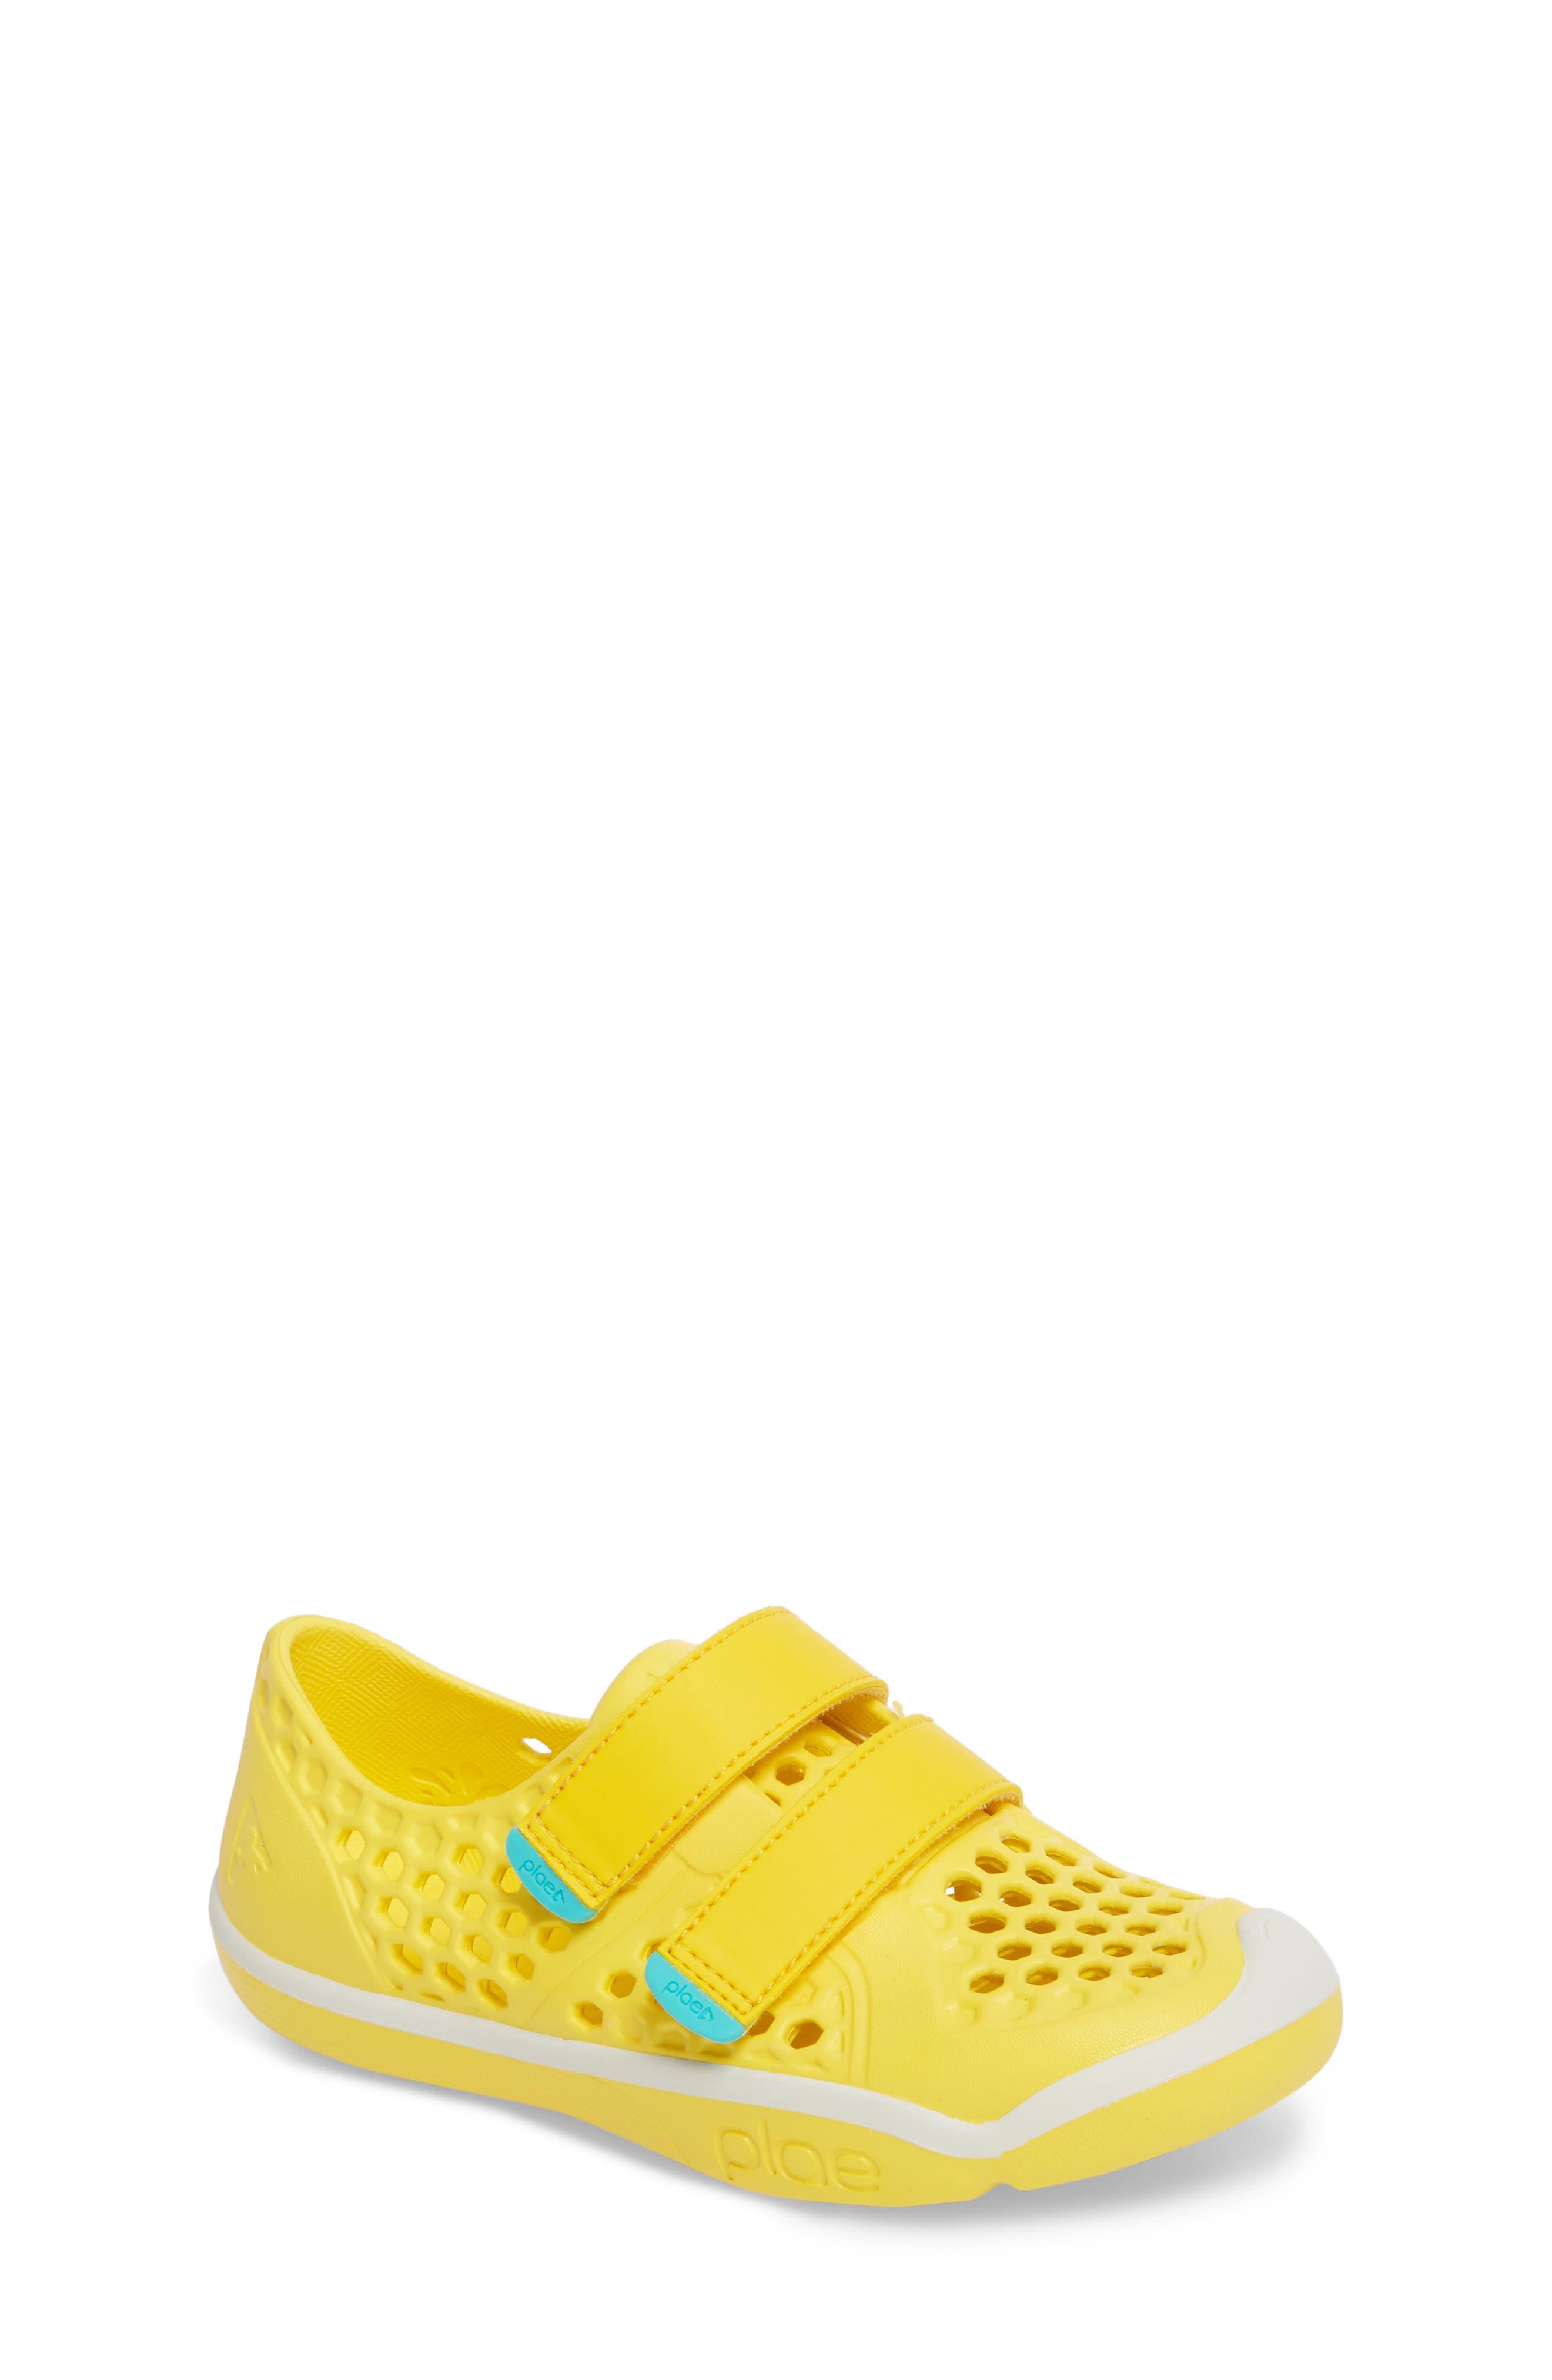 Mimo Customizable Sneaker,                         Main,                         color, Dandelion